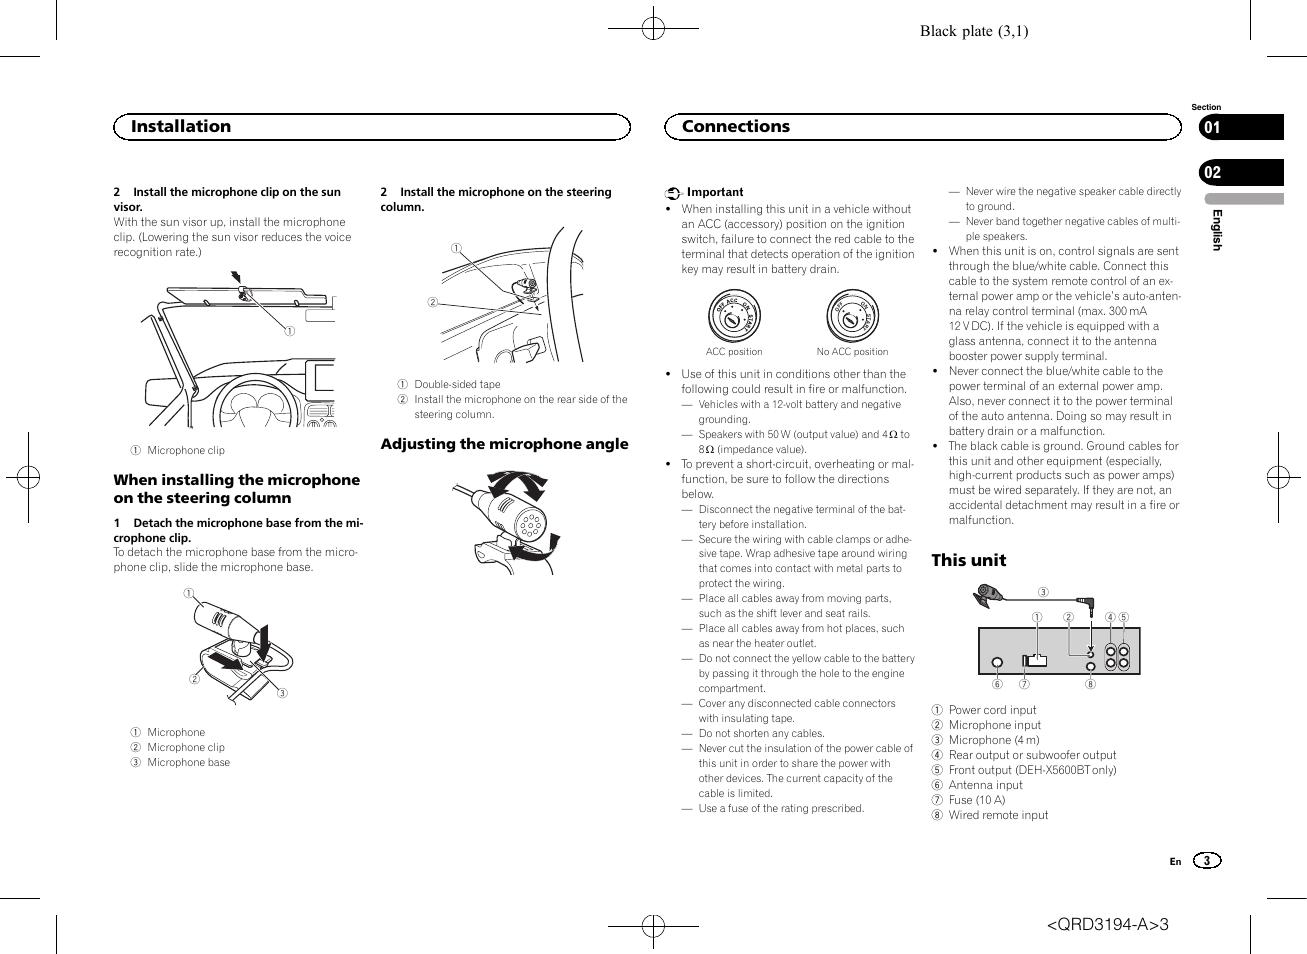 [DIAGRAM_3ER]  WIRING DIAGRAM PIONEER DEH 815 - | Wiring Diagram Pioneer Deh 815 |  | wiring-diagram-pioneer-deh-815.ma-run.com